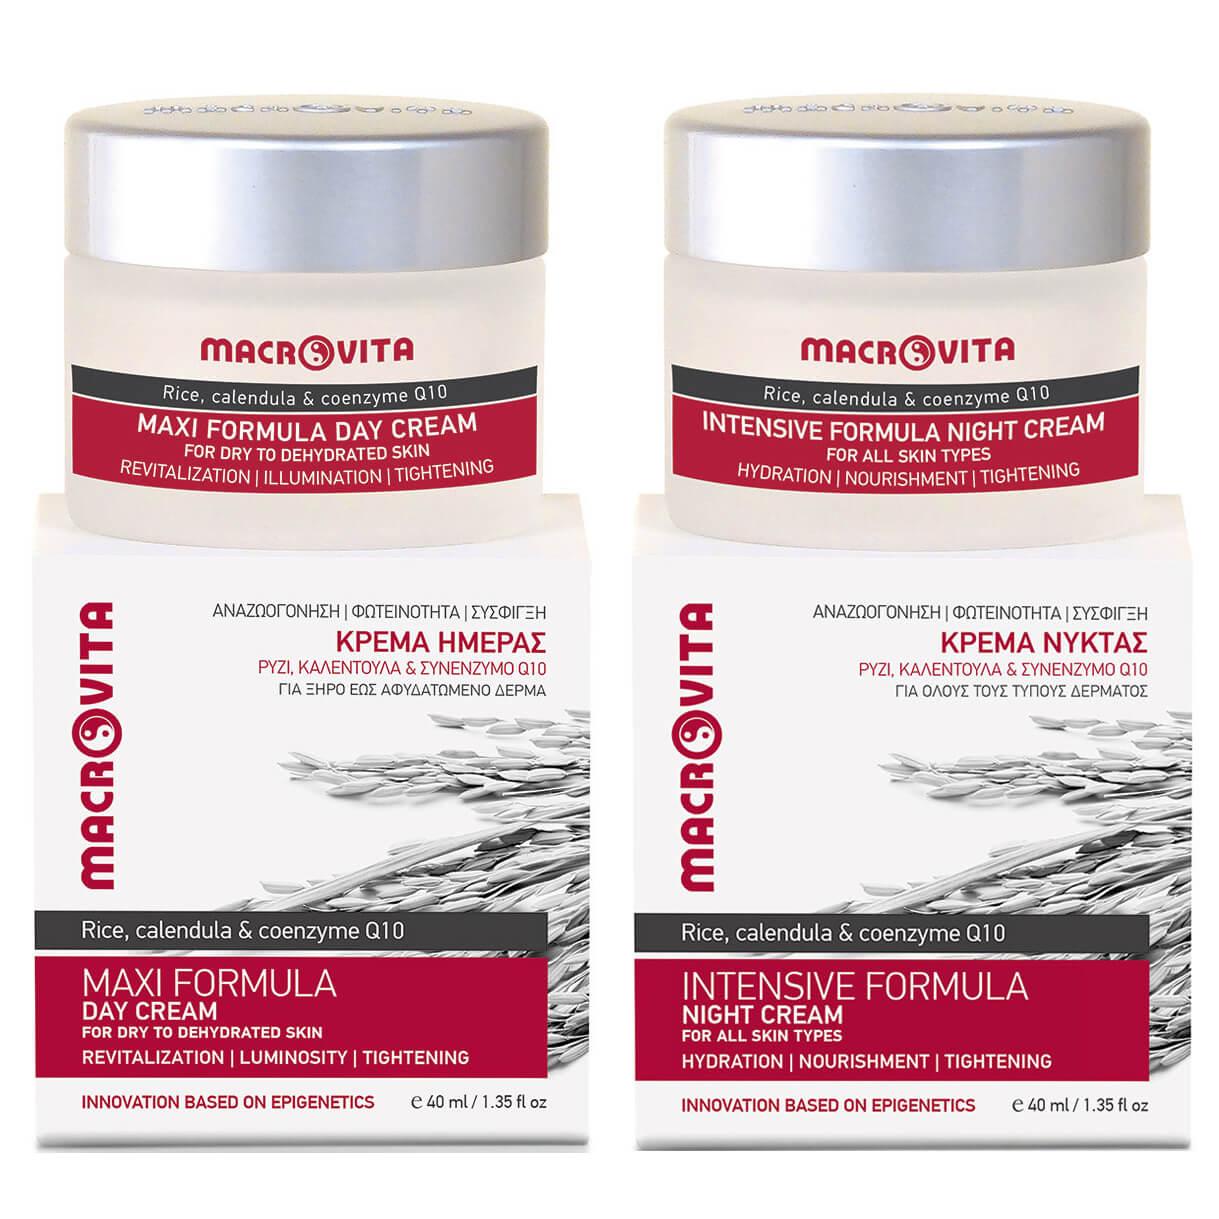 Macrovita Πακέτο Προσφοράς Maxi Formula Day Cream 40ml & Δώρο Intensive Formula Night Cream 40ml & Πρακτικό Νεσεσέρ